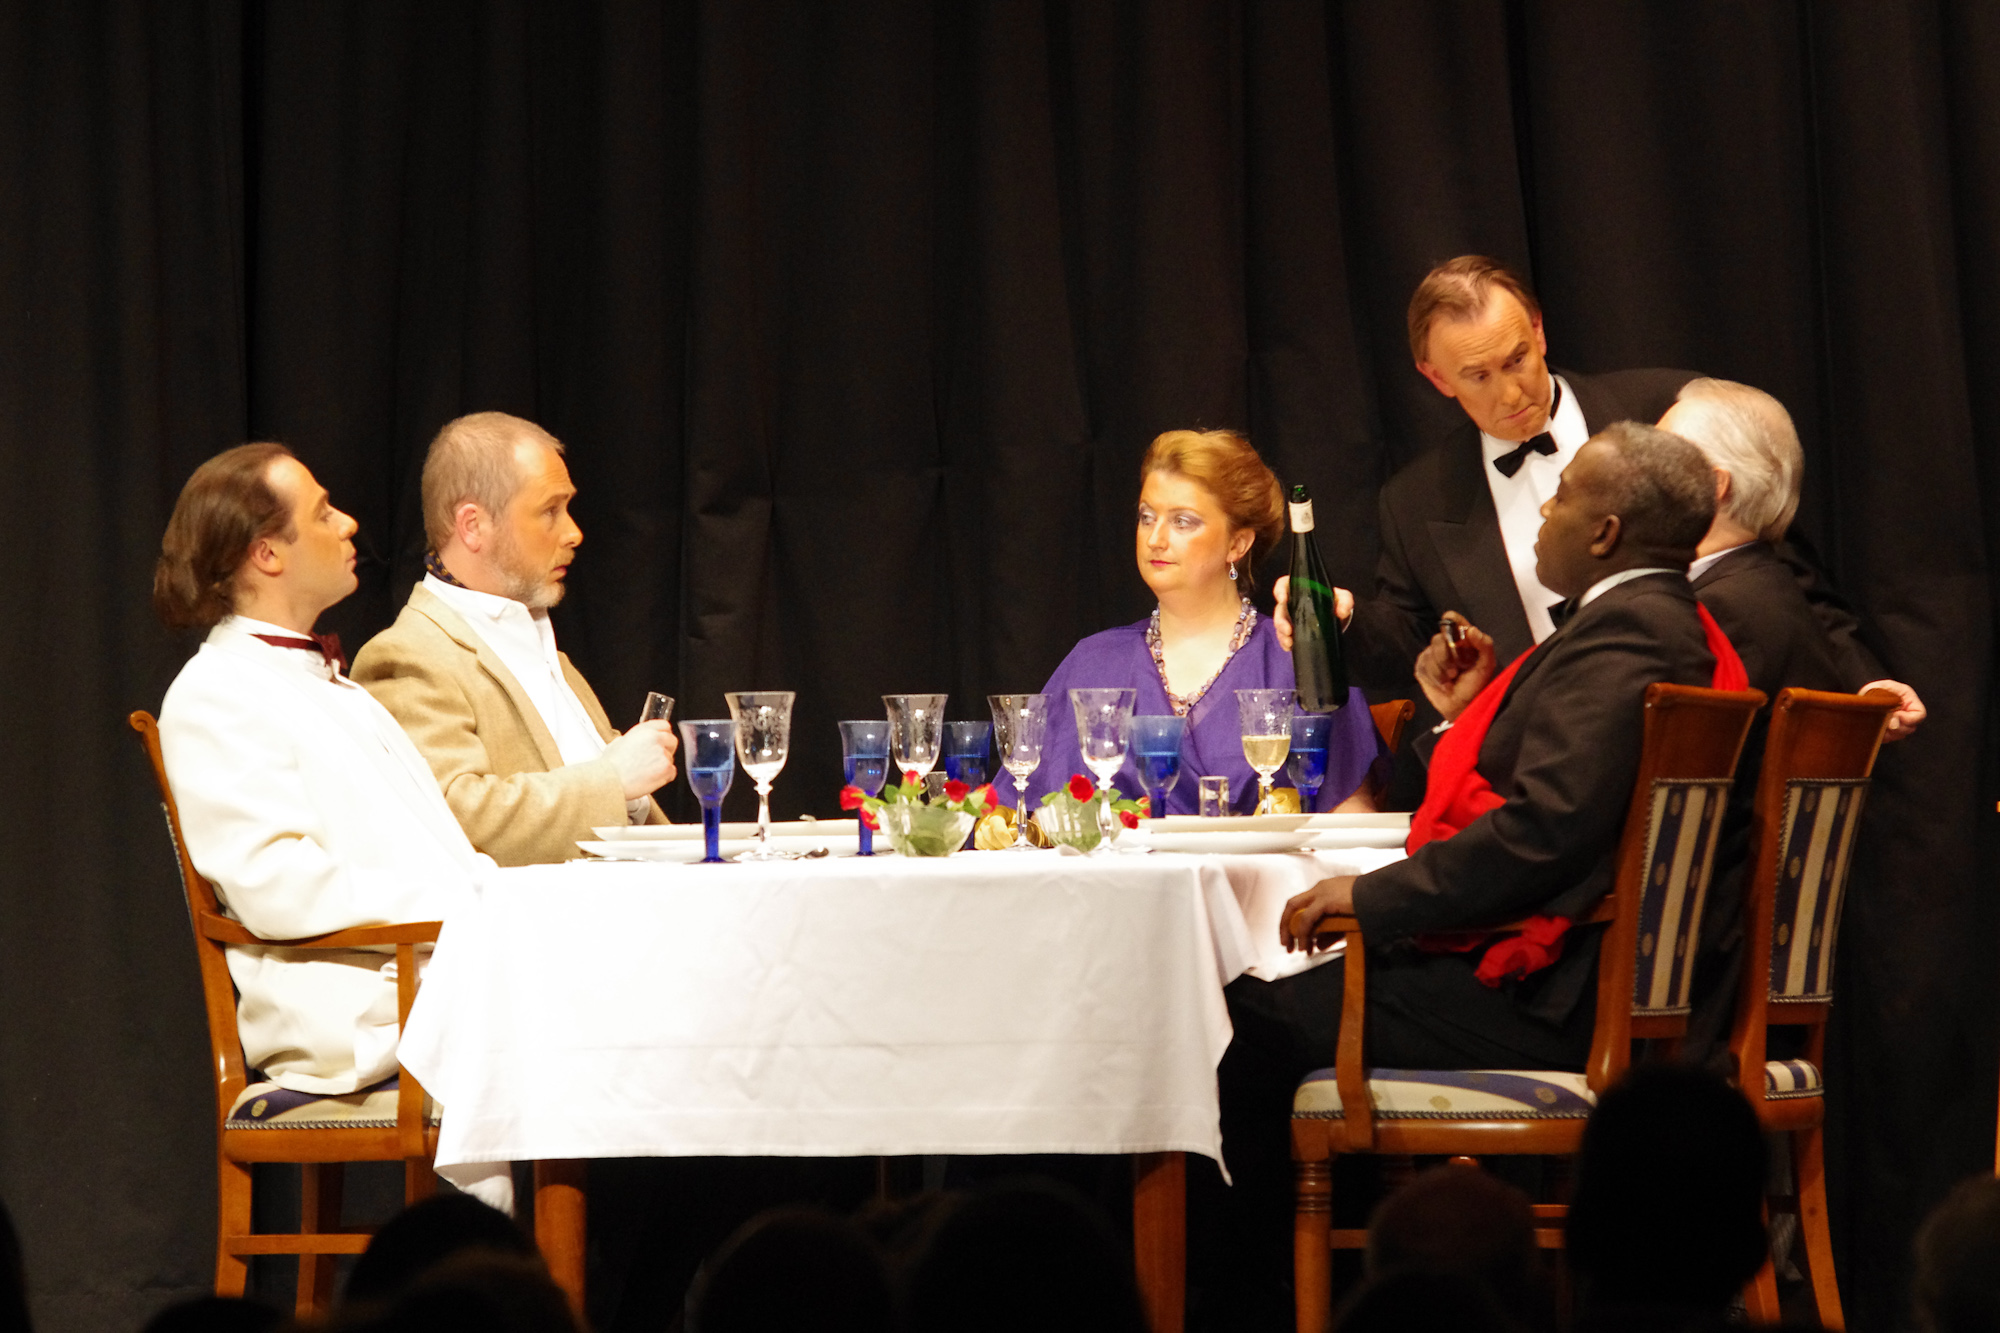 "Olivier Gigaud, Jürgen Stockhausen, Sarnia Schüßler, Mike Riepl, Roy Mroch and Joseph Sweet in ""Dinner for Five"" by Mike Riepl - Jan / Feb 2012"